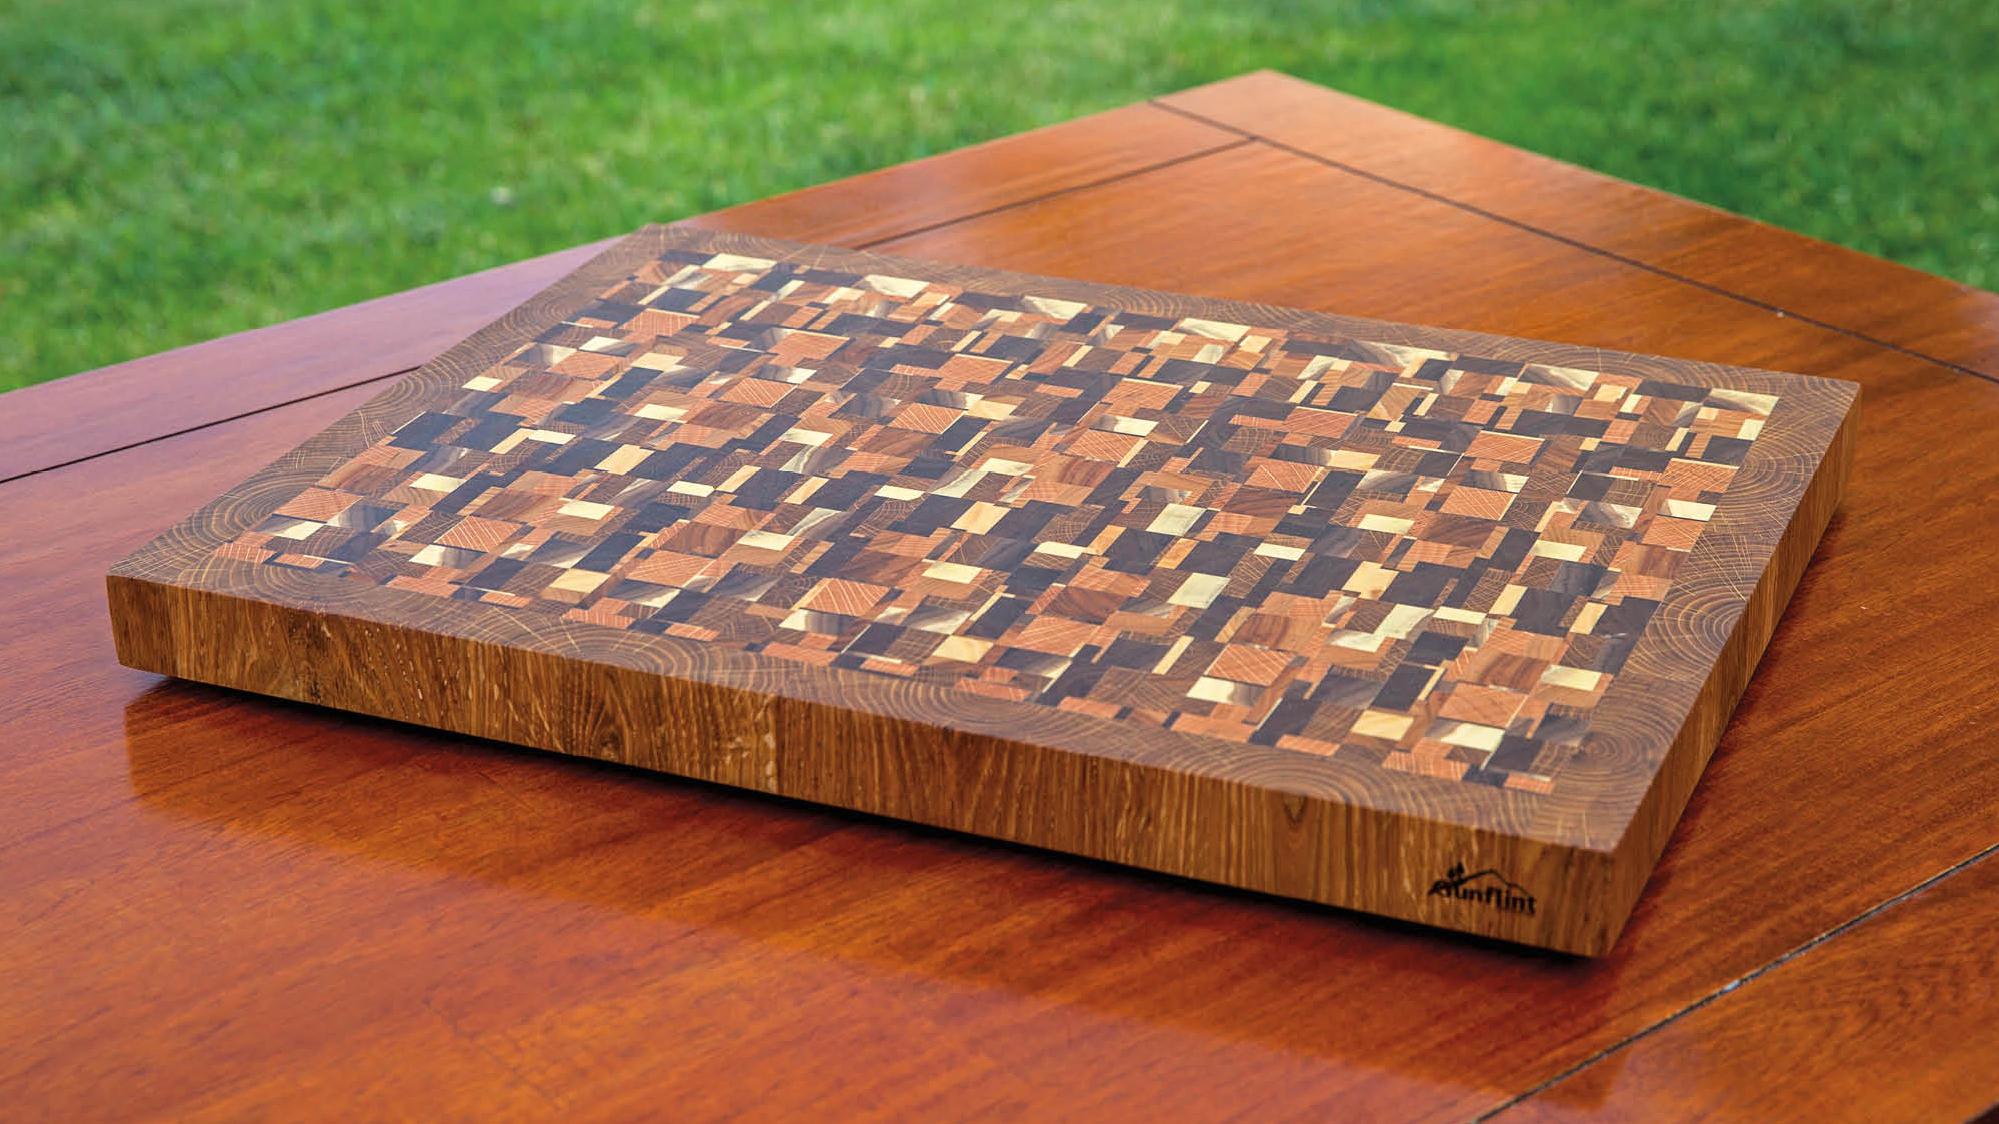 Chaotic Cutting Board